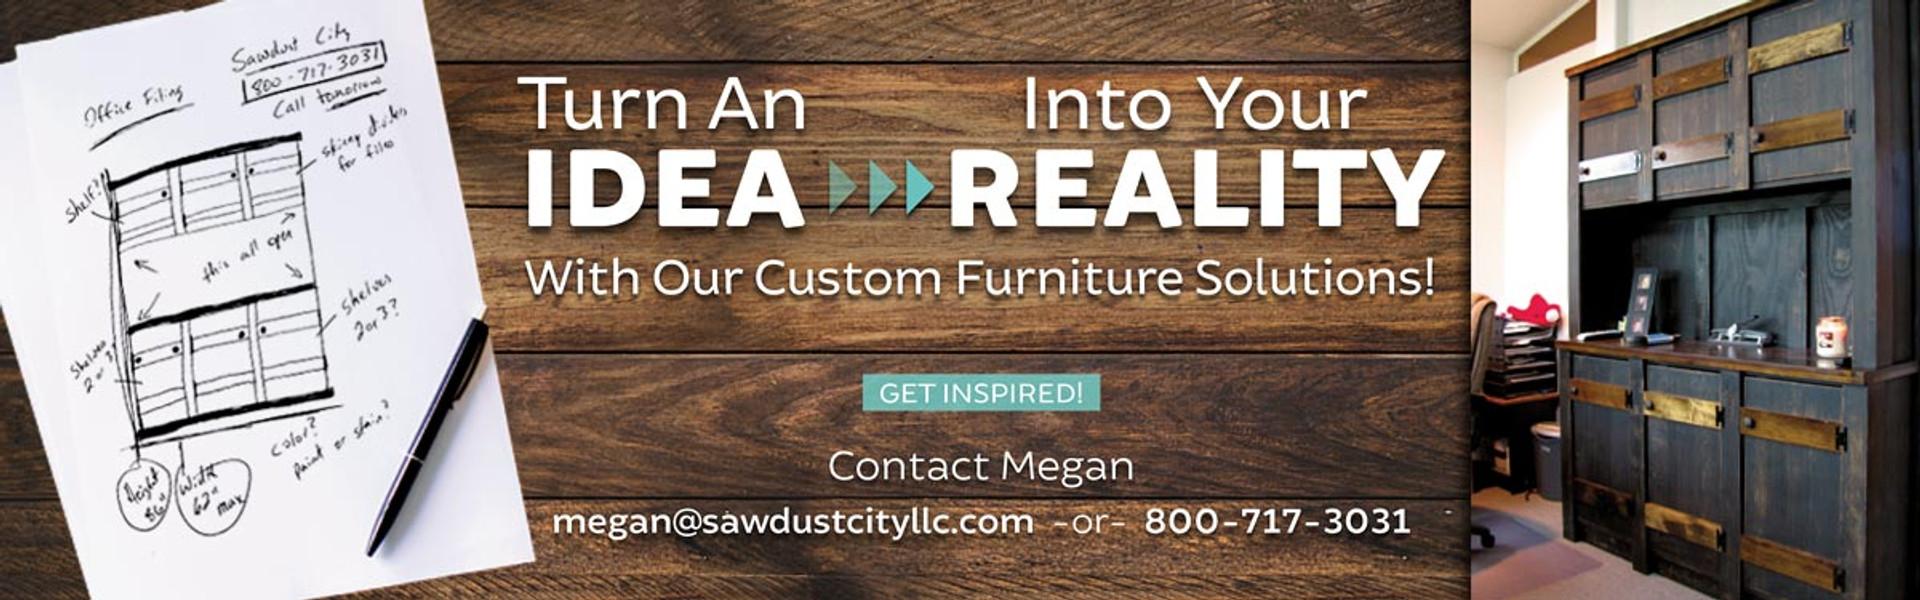 Turn An Idea Into Reality - With Sawdust City Custom Furniture Solutions! Contact megan@sawdustcityllc.com